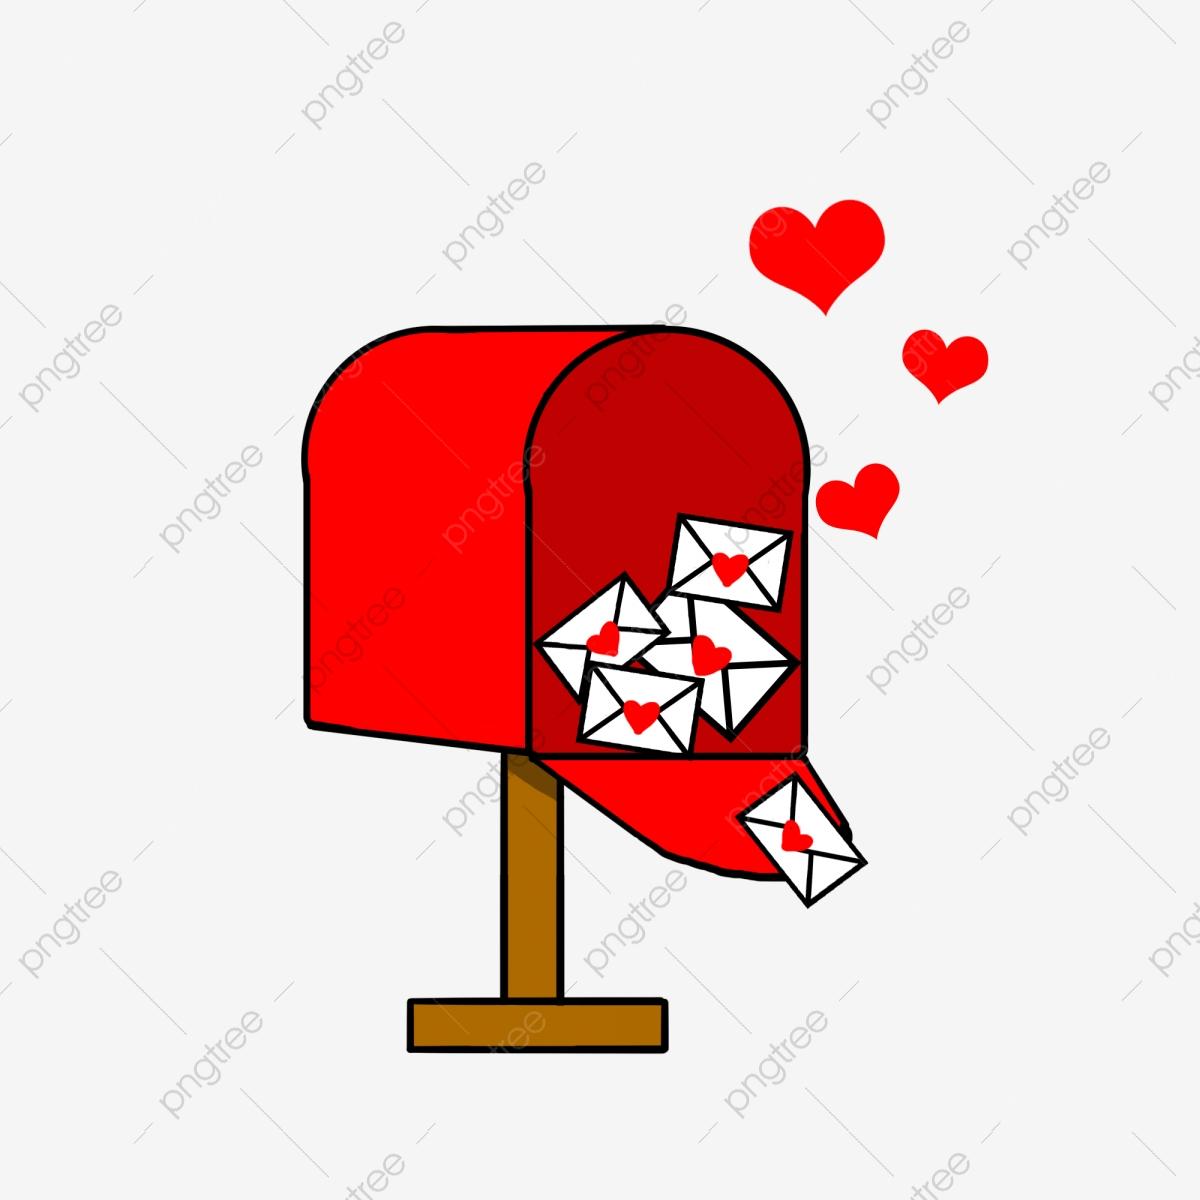 White envelope red shape. Mailbox clipart heart